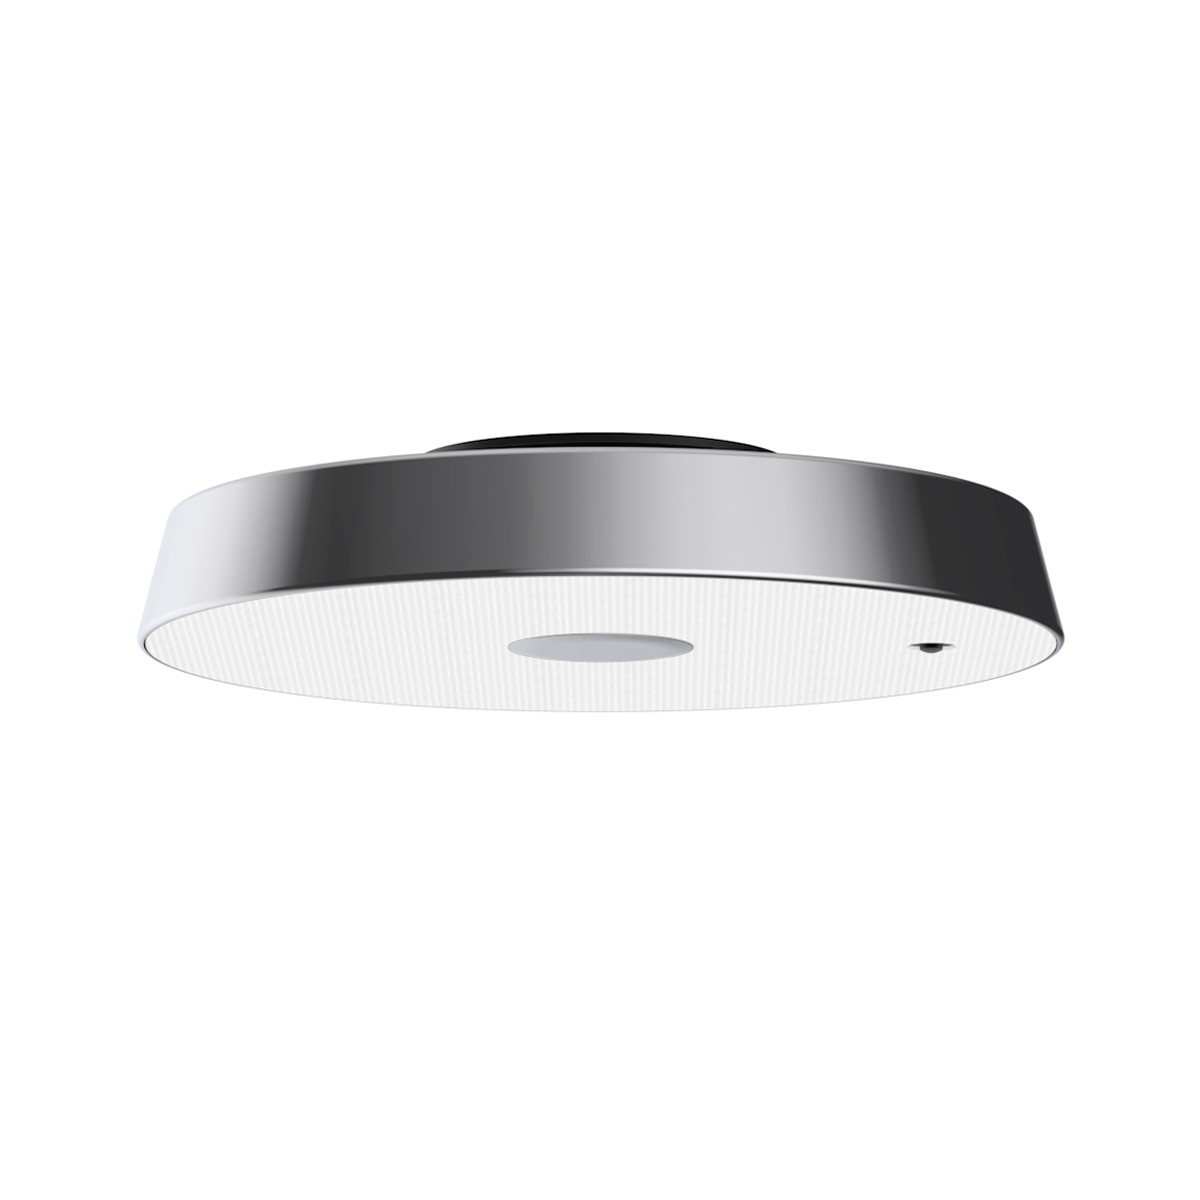 Belux Koi-S LED Deckenleuchte, dimmbar DALI, 3000K, Chrom